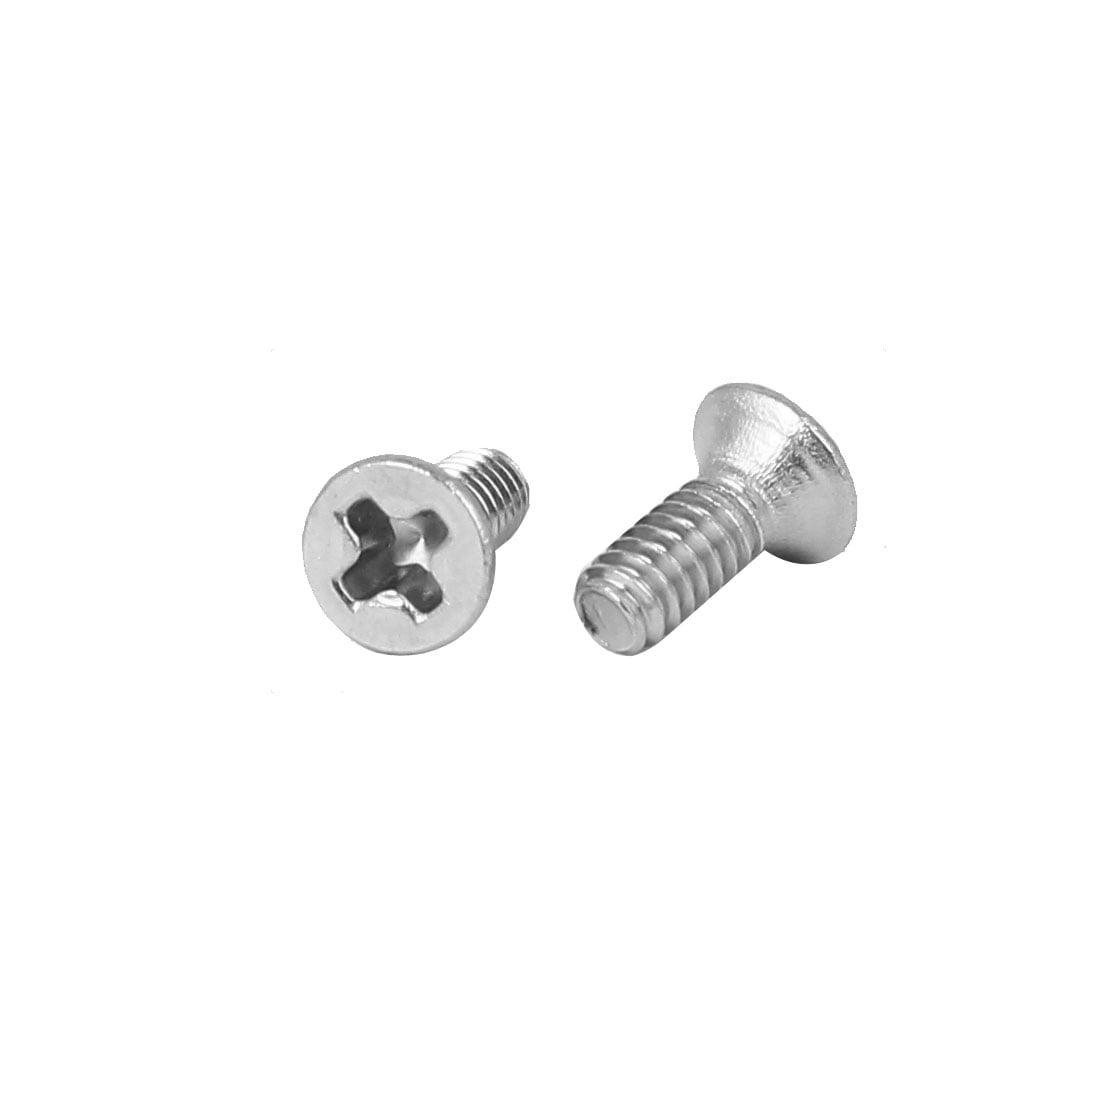 80 Pcs M2x5mm 316 Stainless Steel Flat Head Phillips Machine Screws Fasteners - image 1 of 2